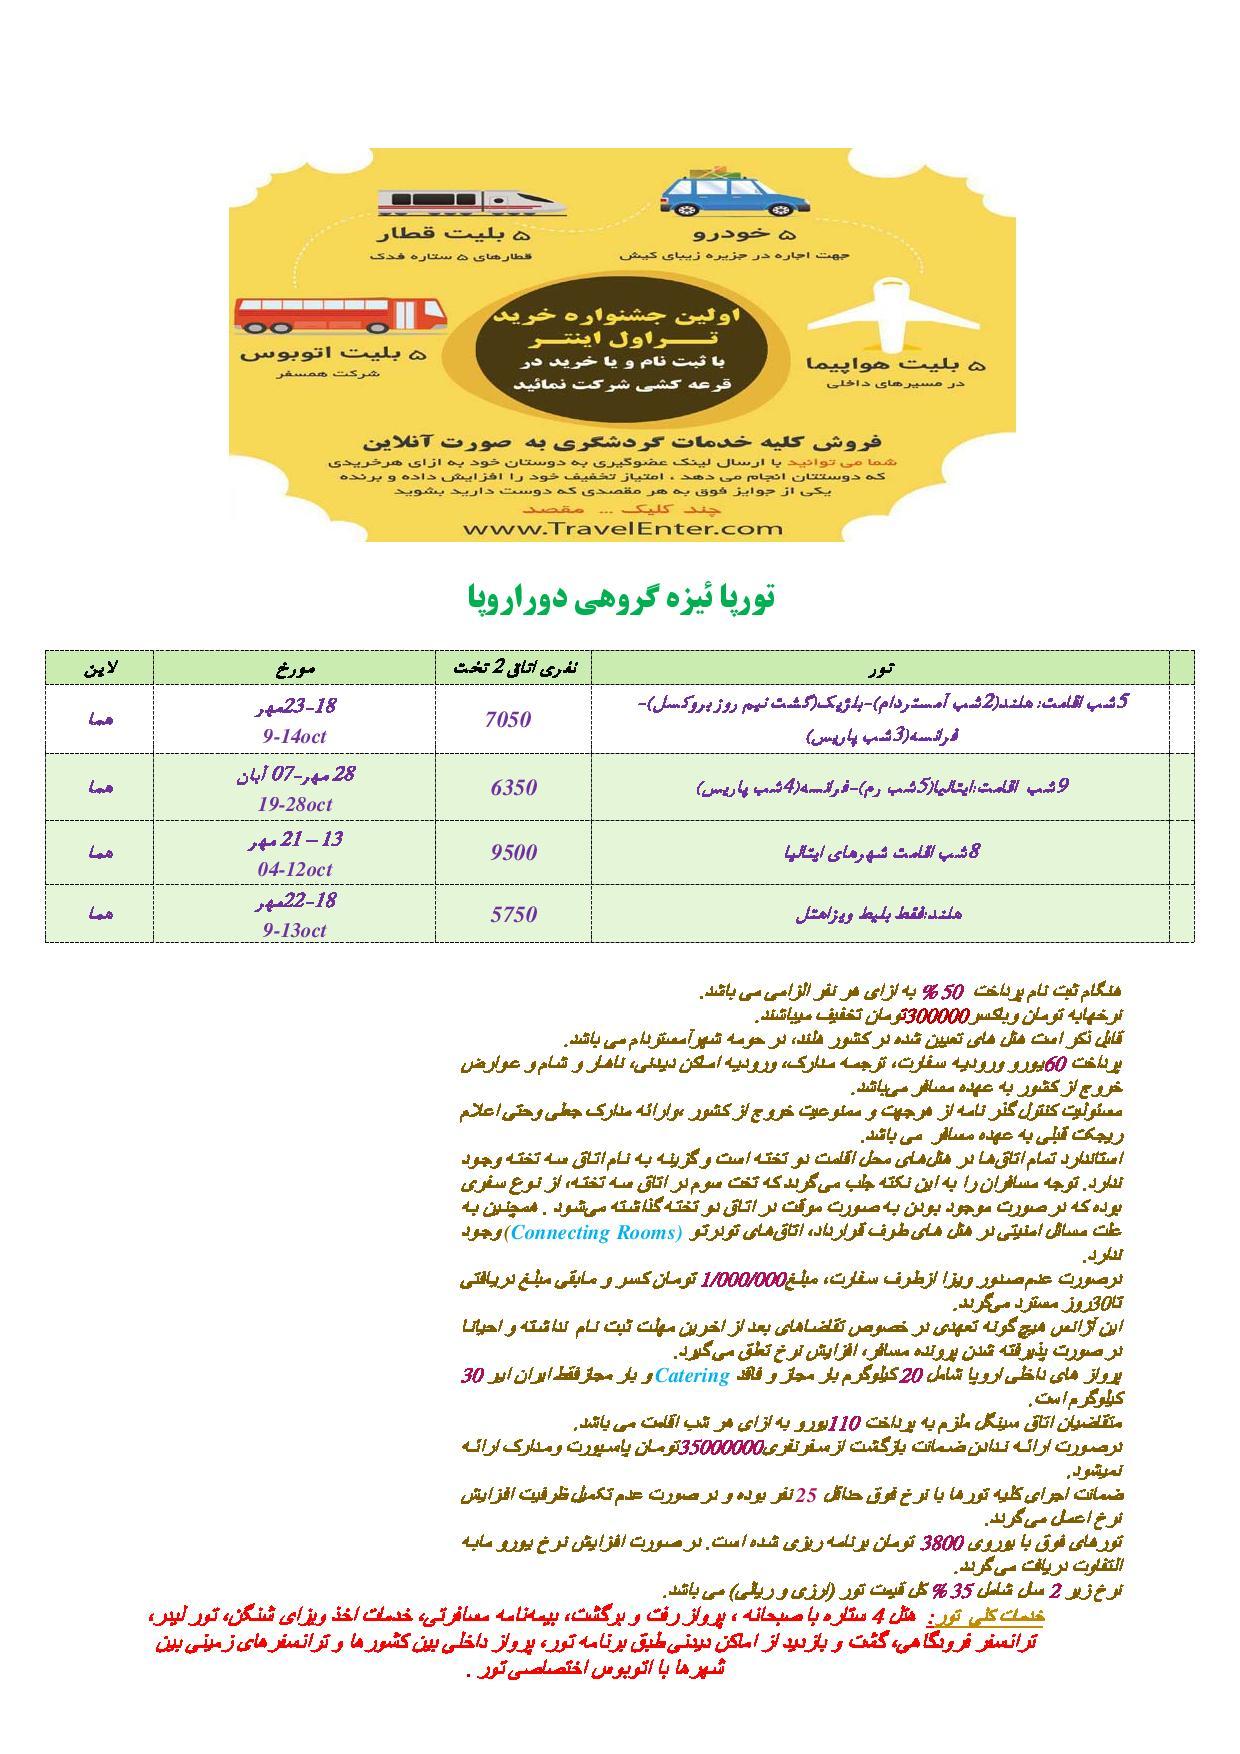 asp-page-0014